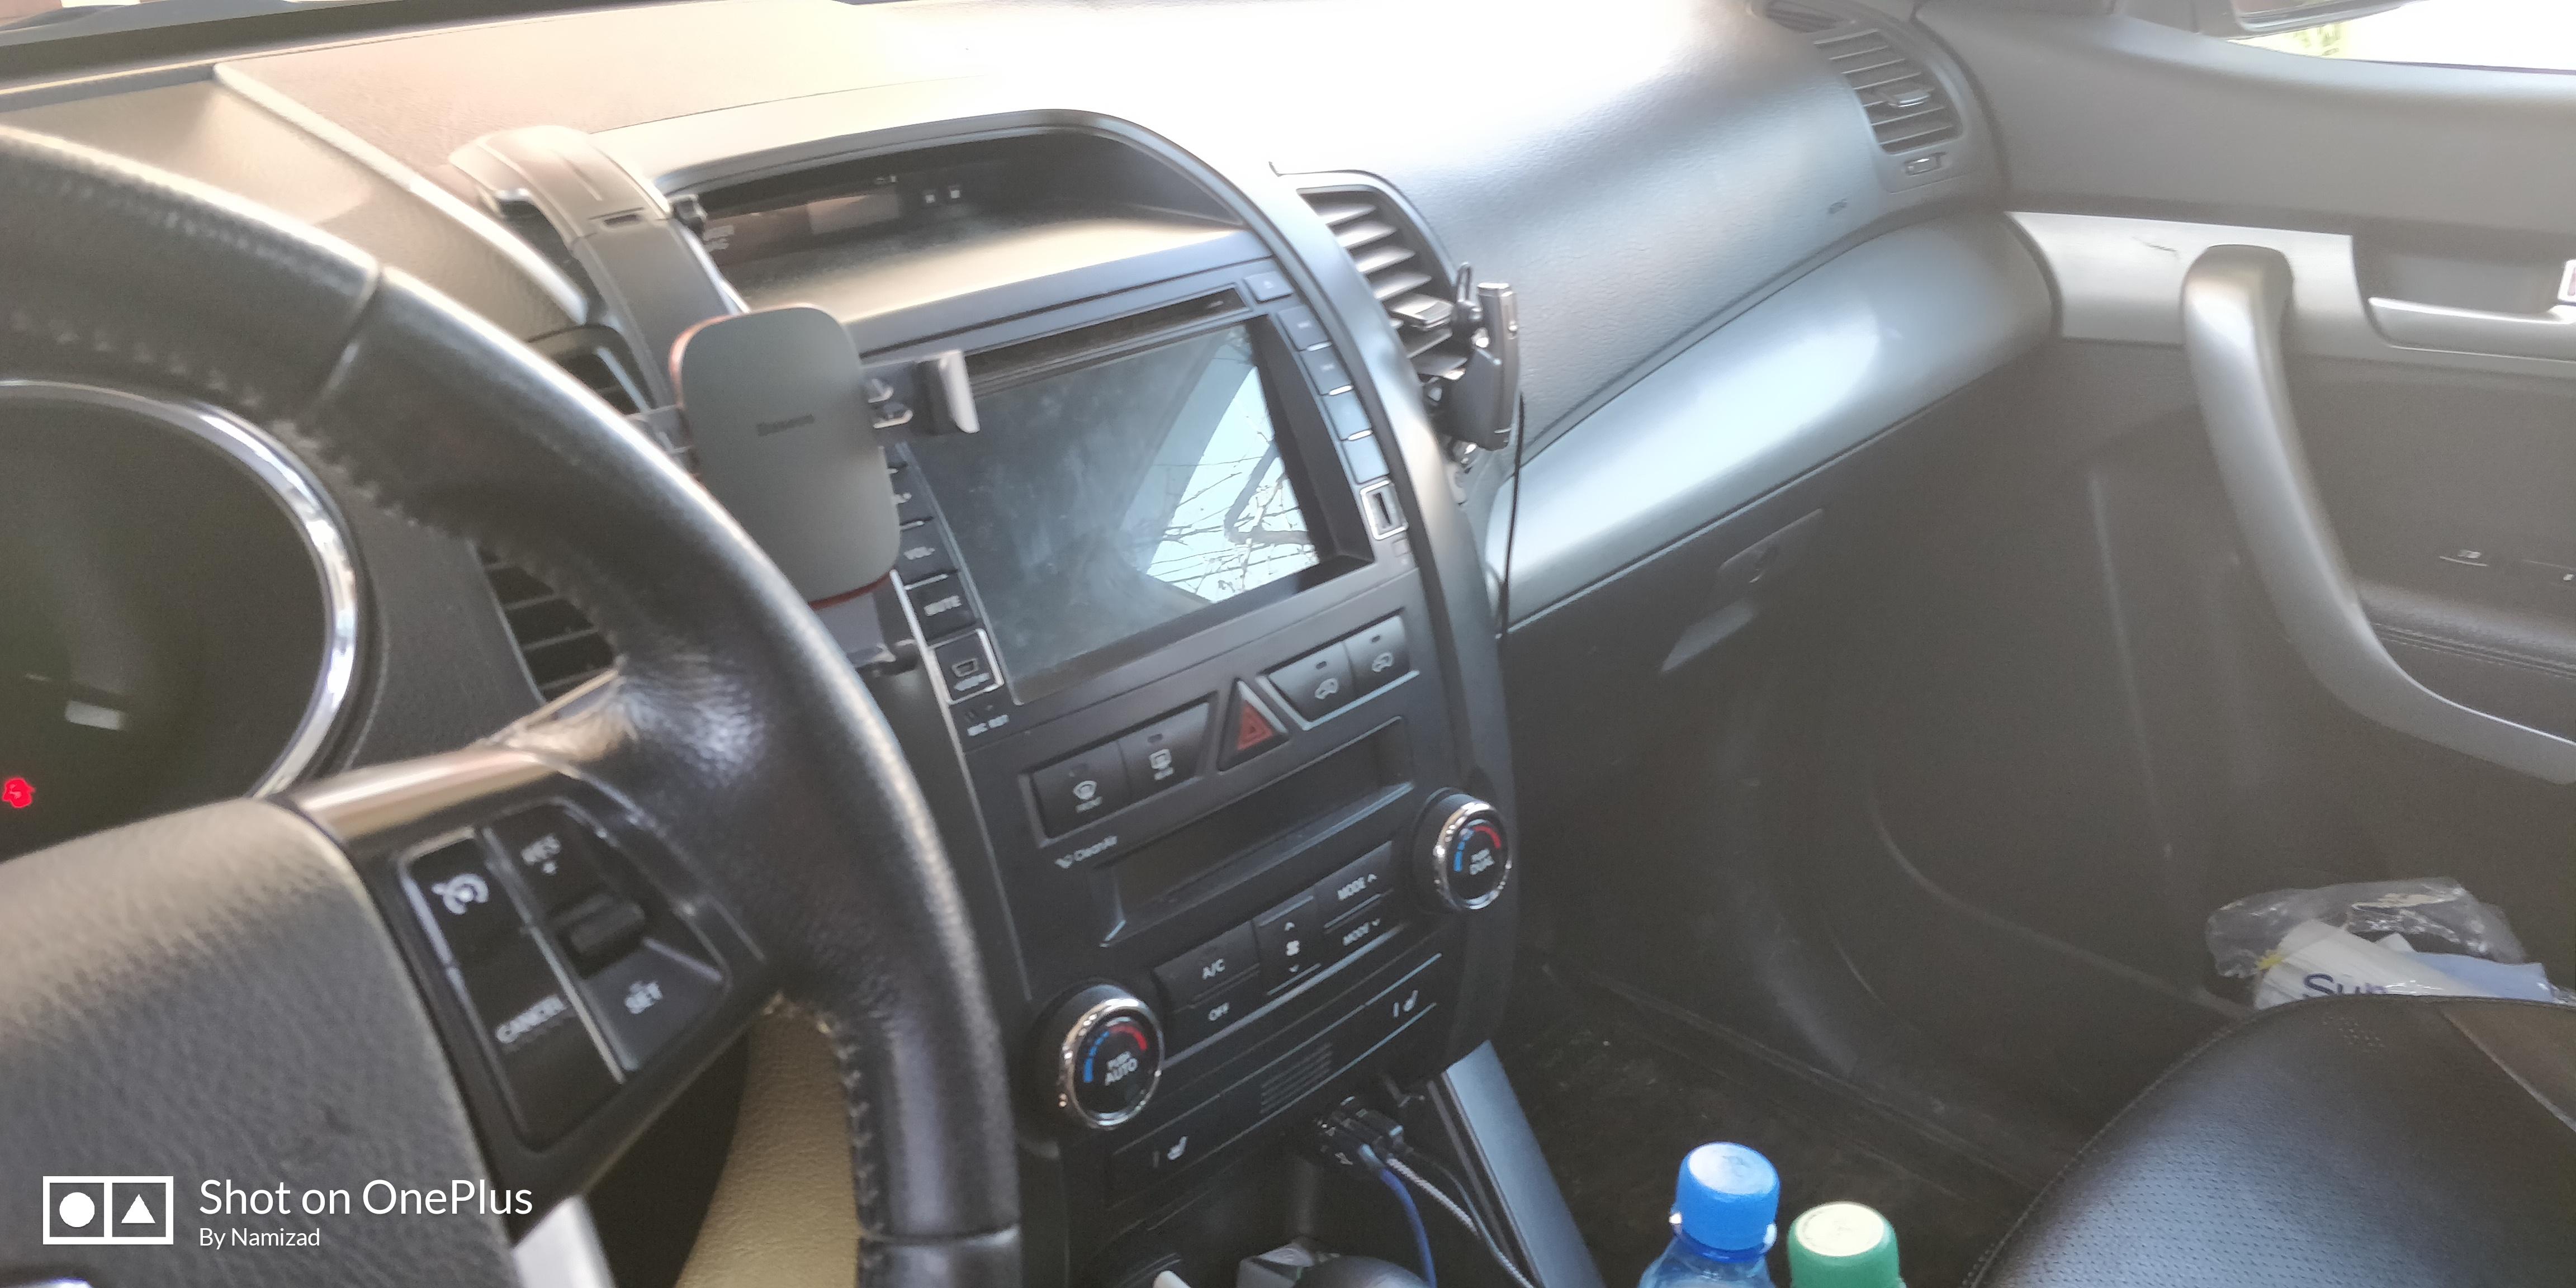 Kia Sorento 2.2(lt) 2010 Подержанный  $15500